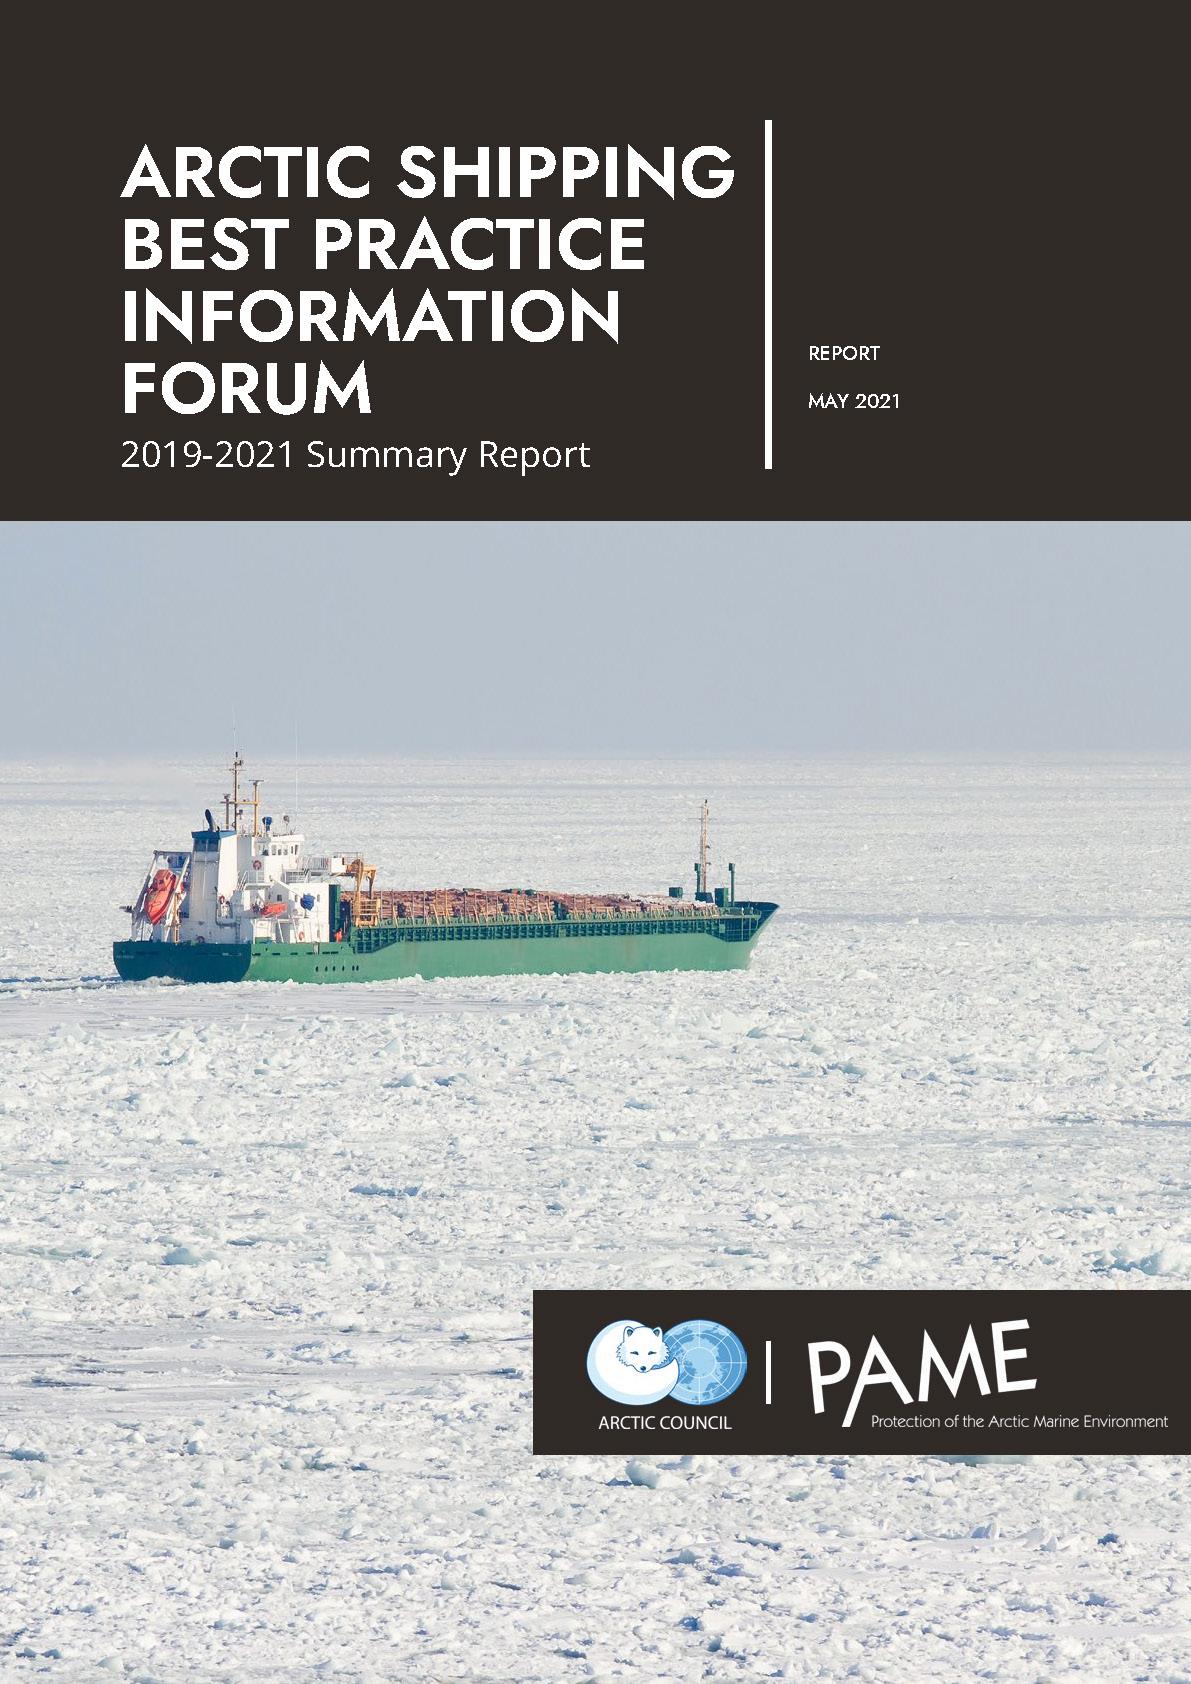 Arctic Shipping Best Practice Information Forum: 2019-2021 Summary